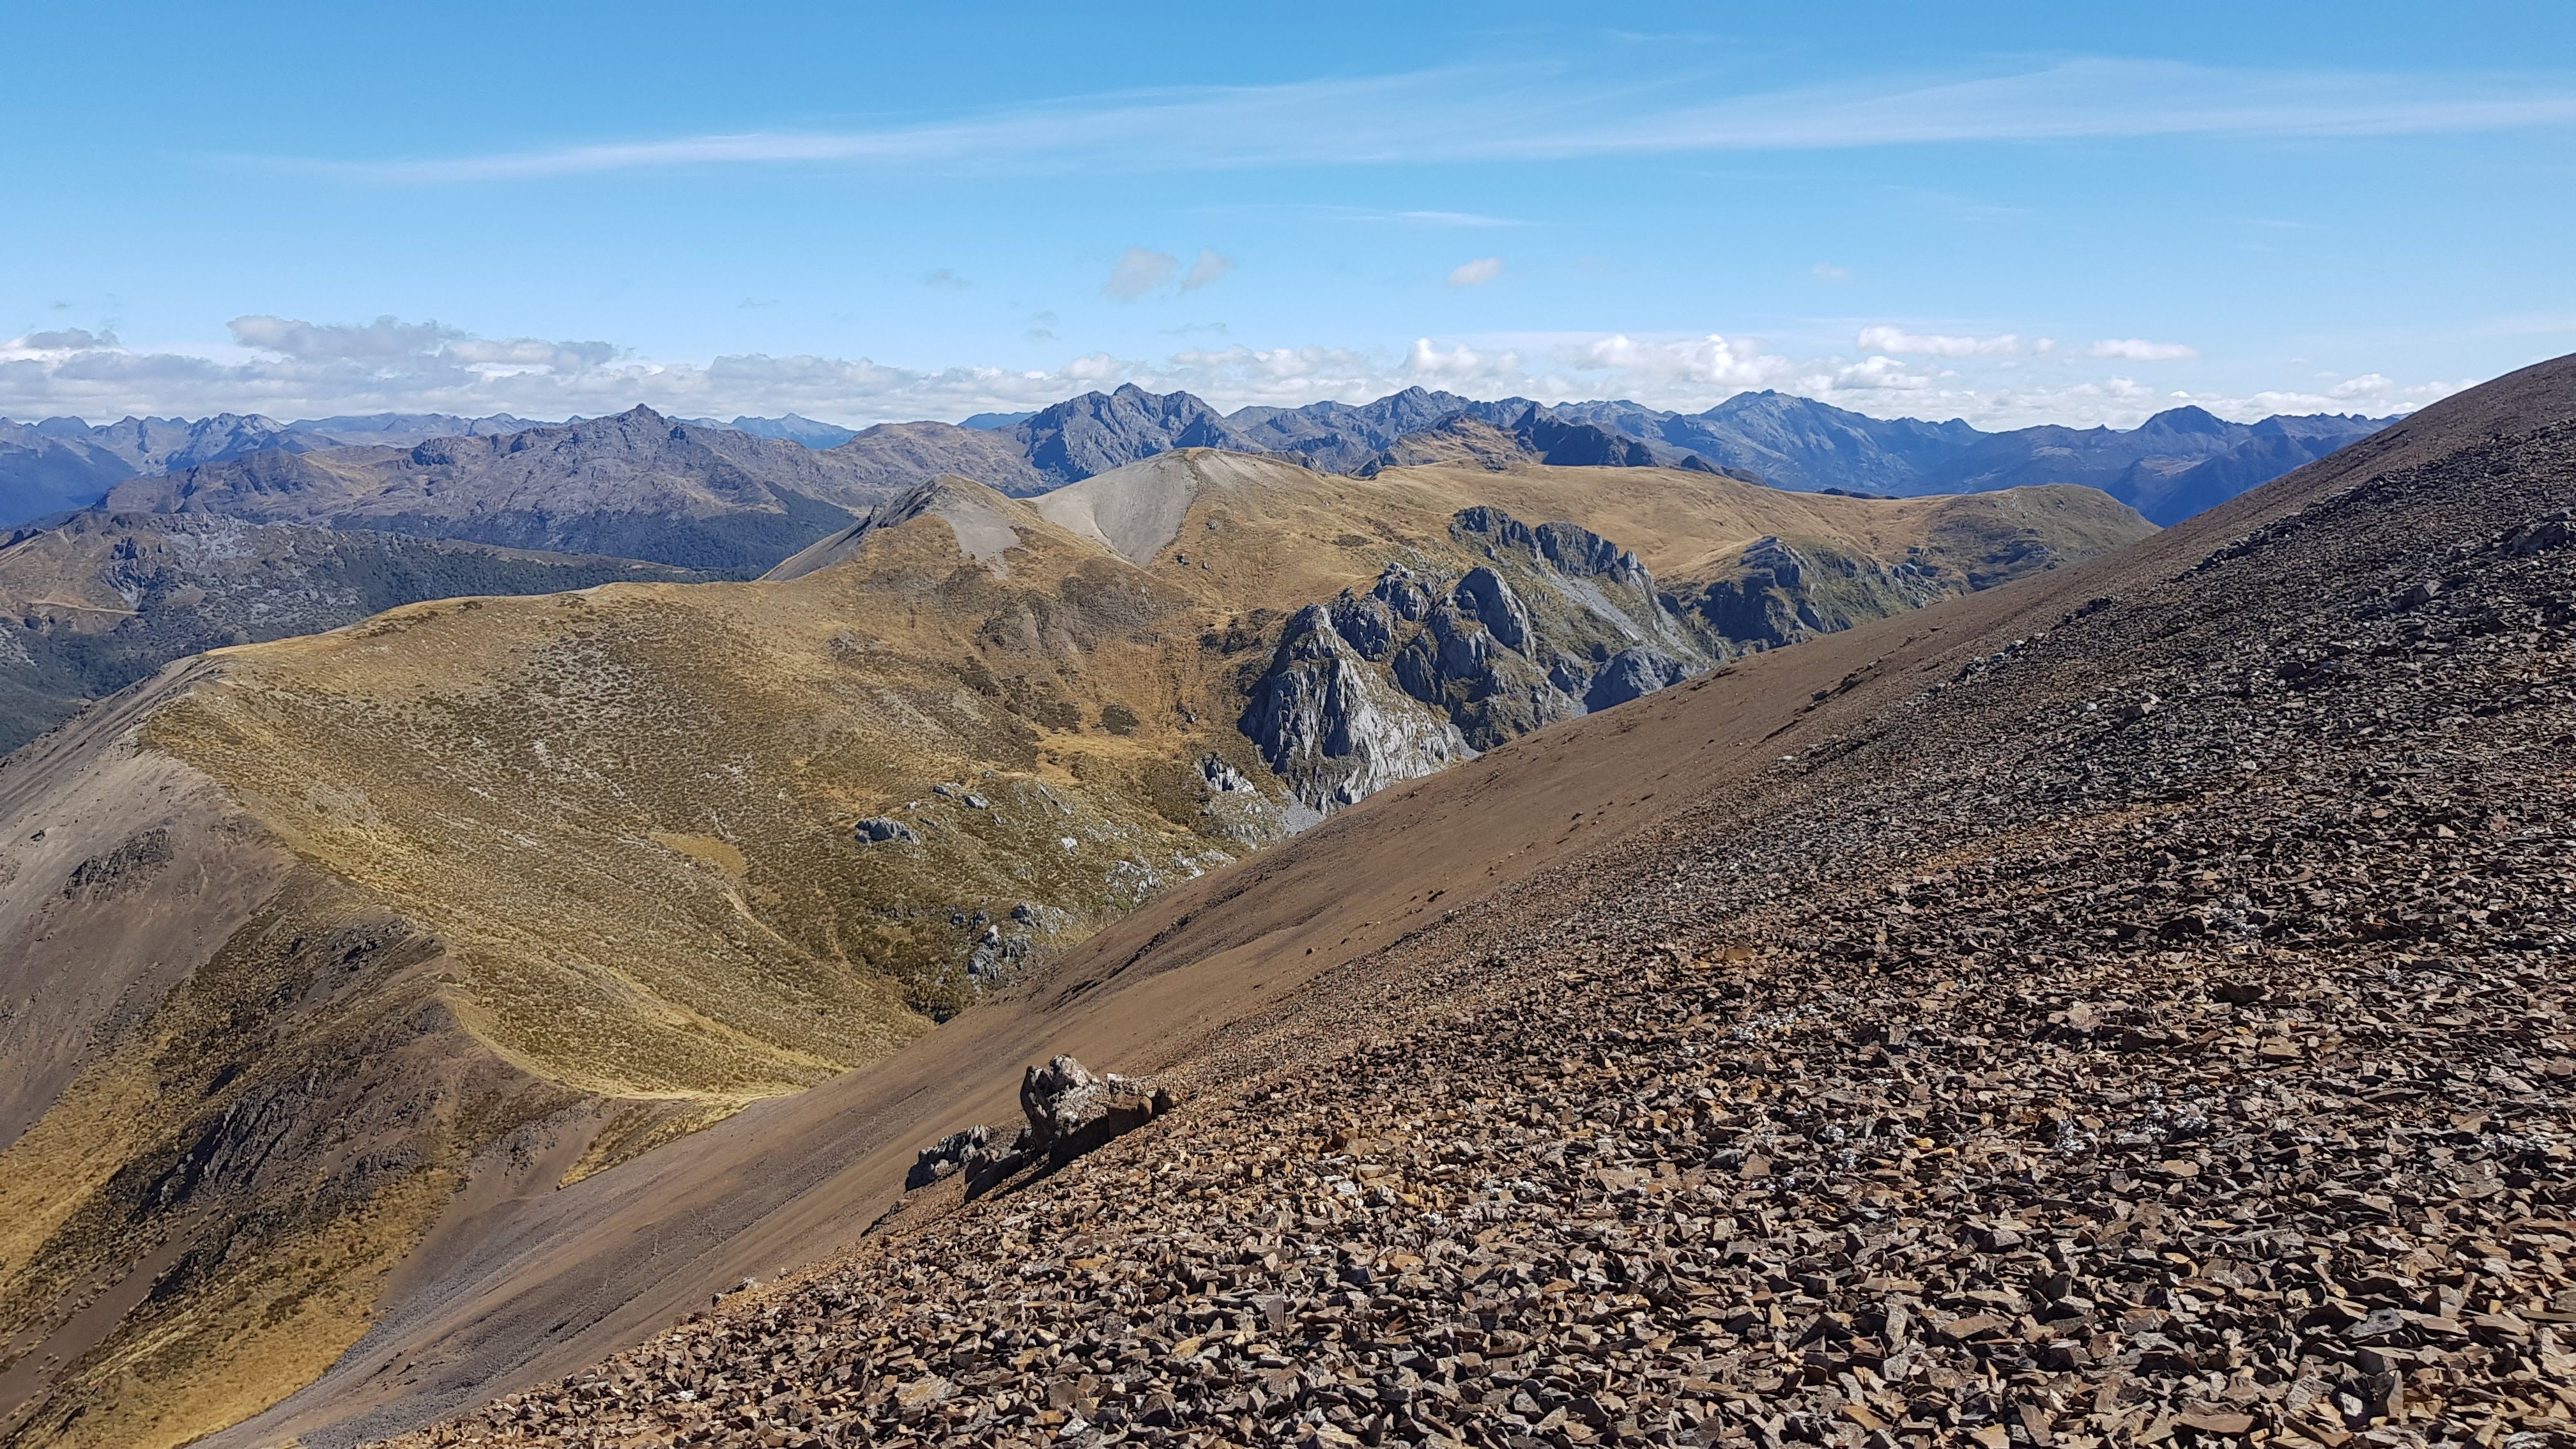 Walking a decent scree slope towards Mount Peel